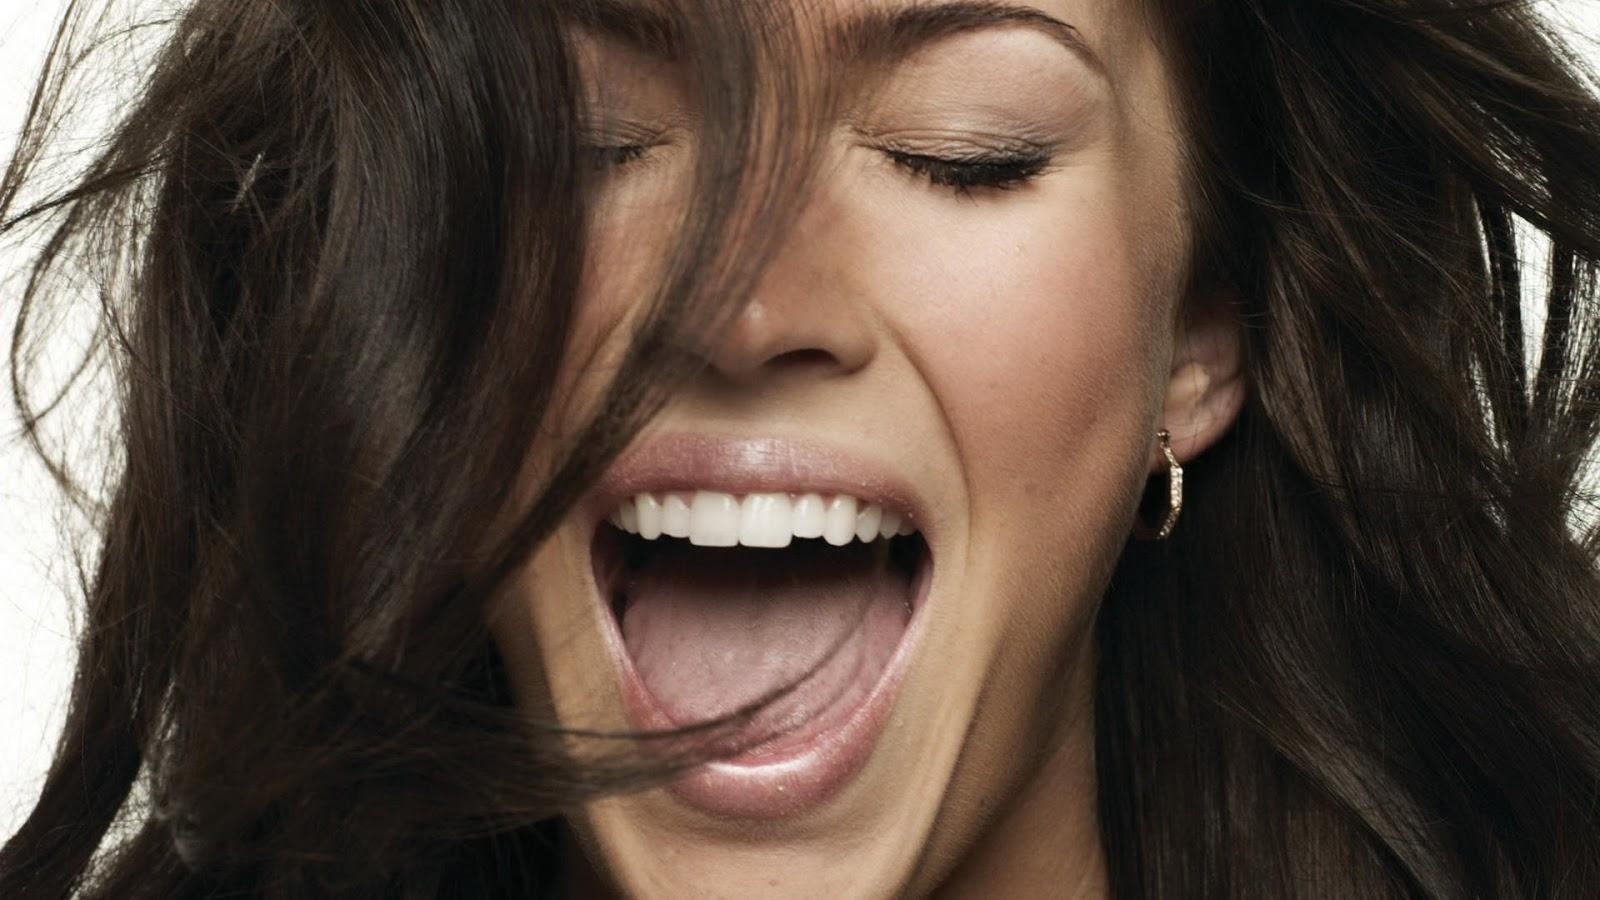 Megan Fox Shouting in Happy Mood 10